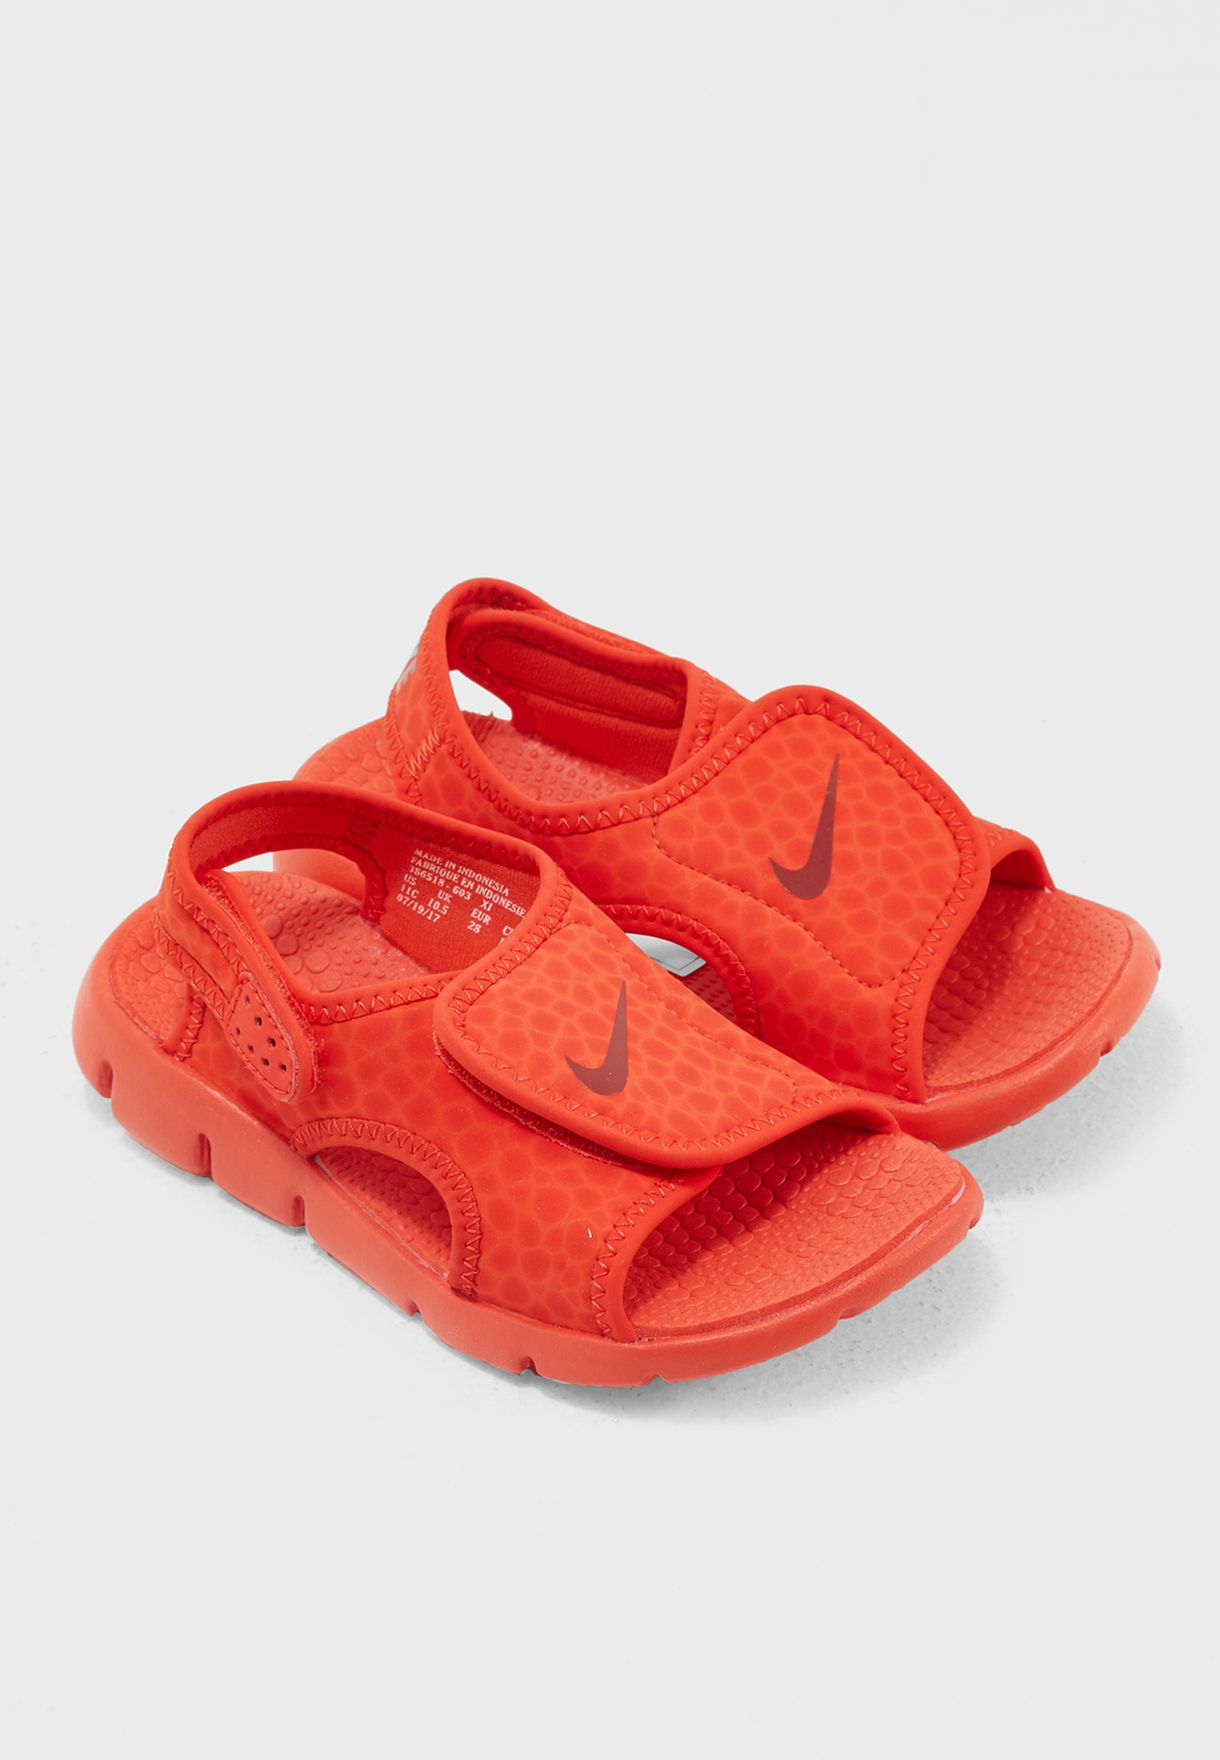 cbc1d4358fa3 Shop Nike orange Sunray Adjust 4 Kids 386518-603 for Kids in UAE ...